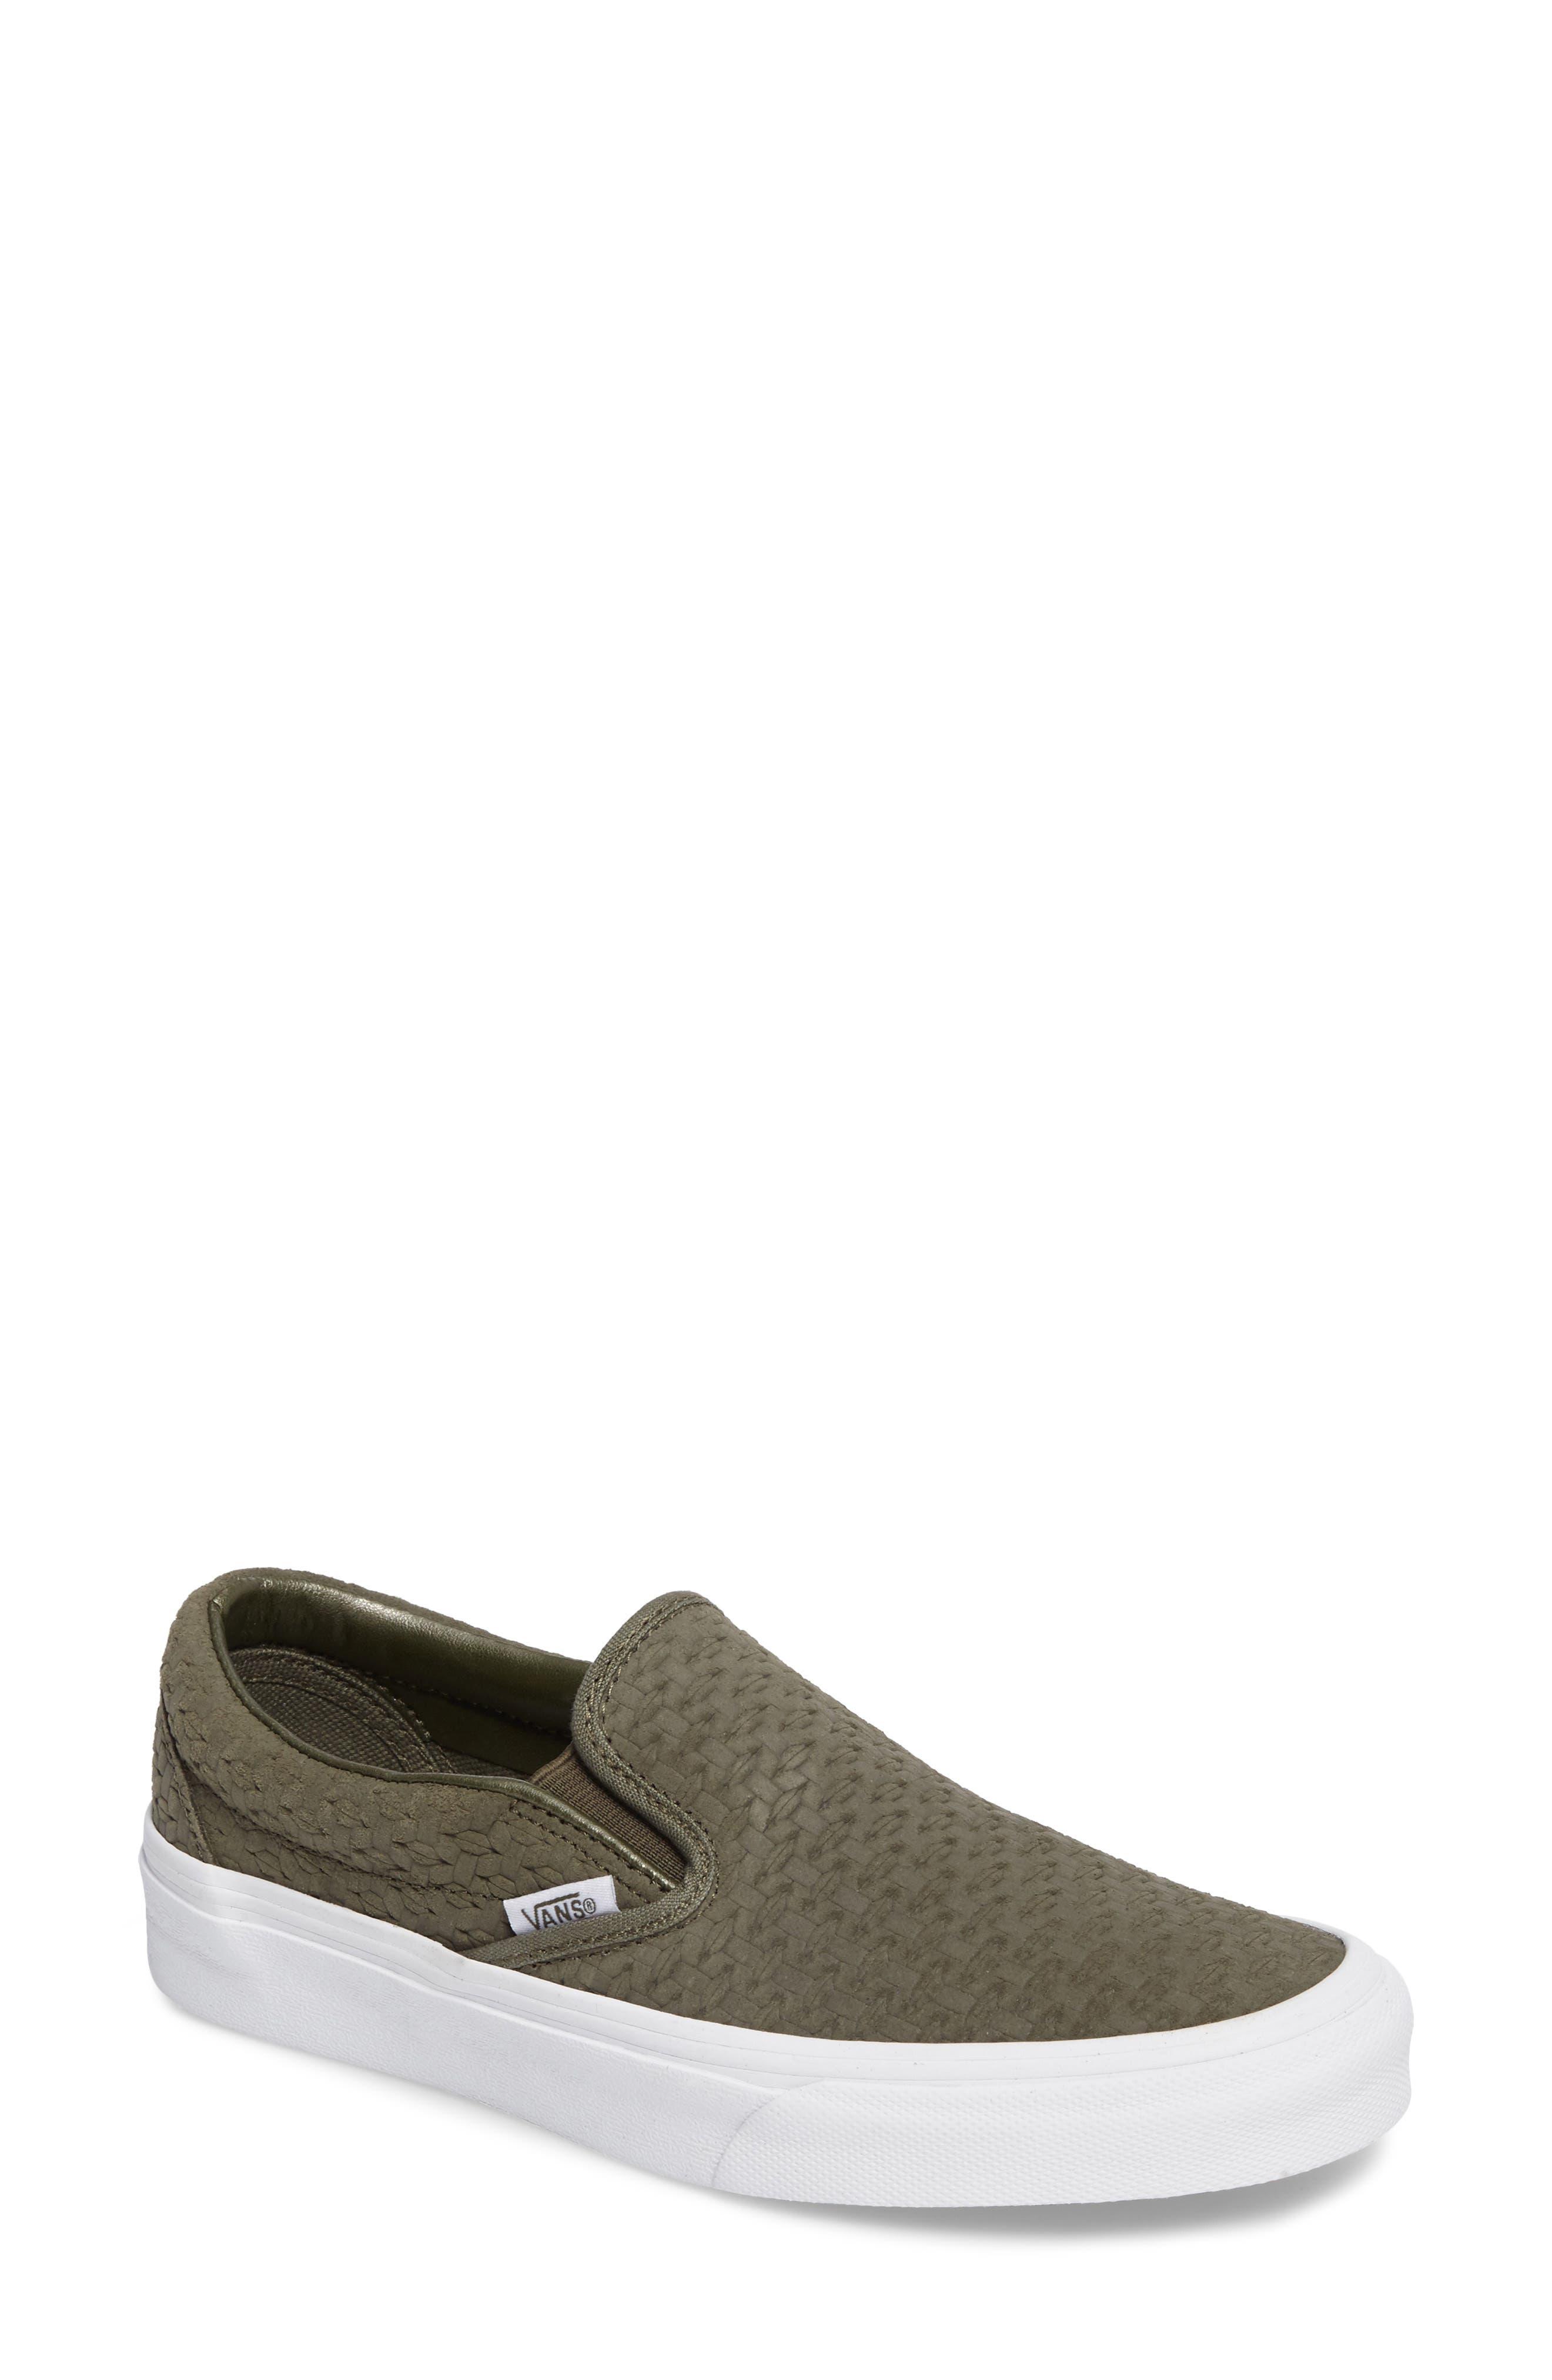 Vans Classic Slip-On Sneaker (Women)